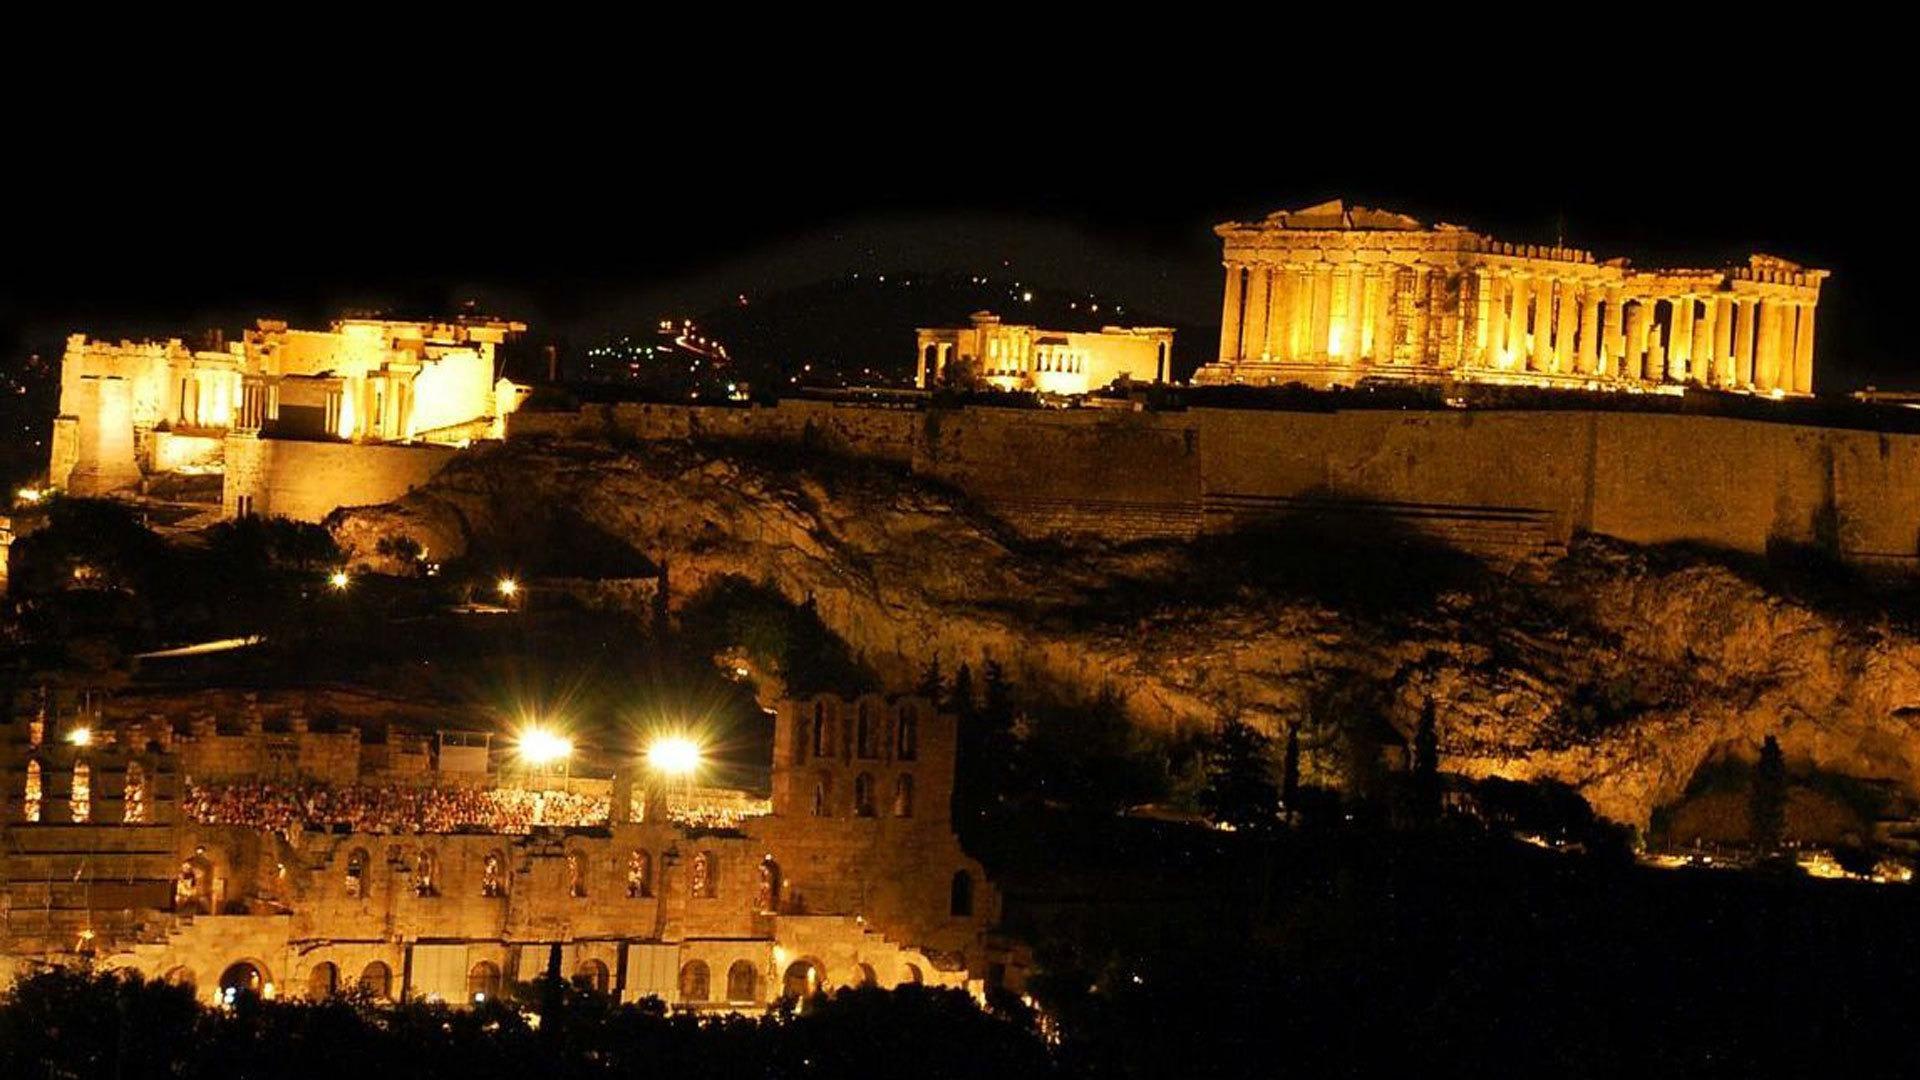 Athens, Acropolis & Parthenon - Certs-it